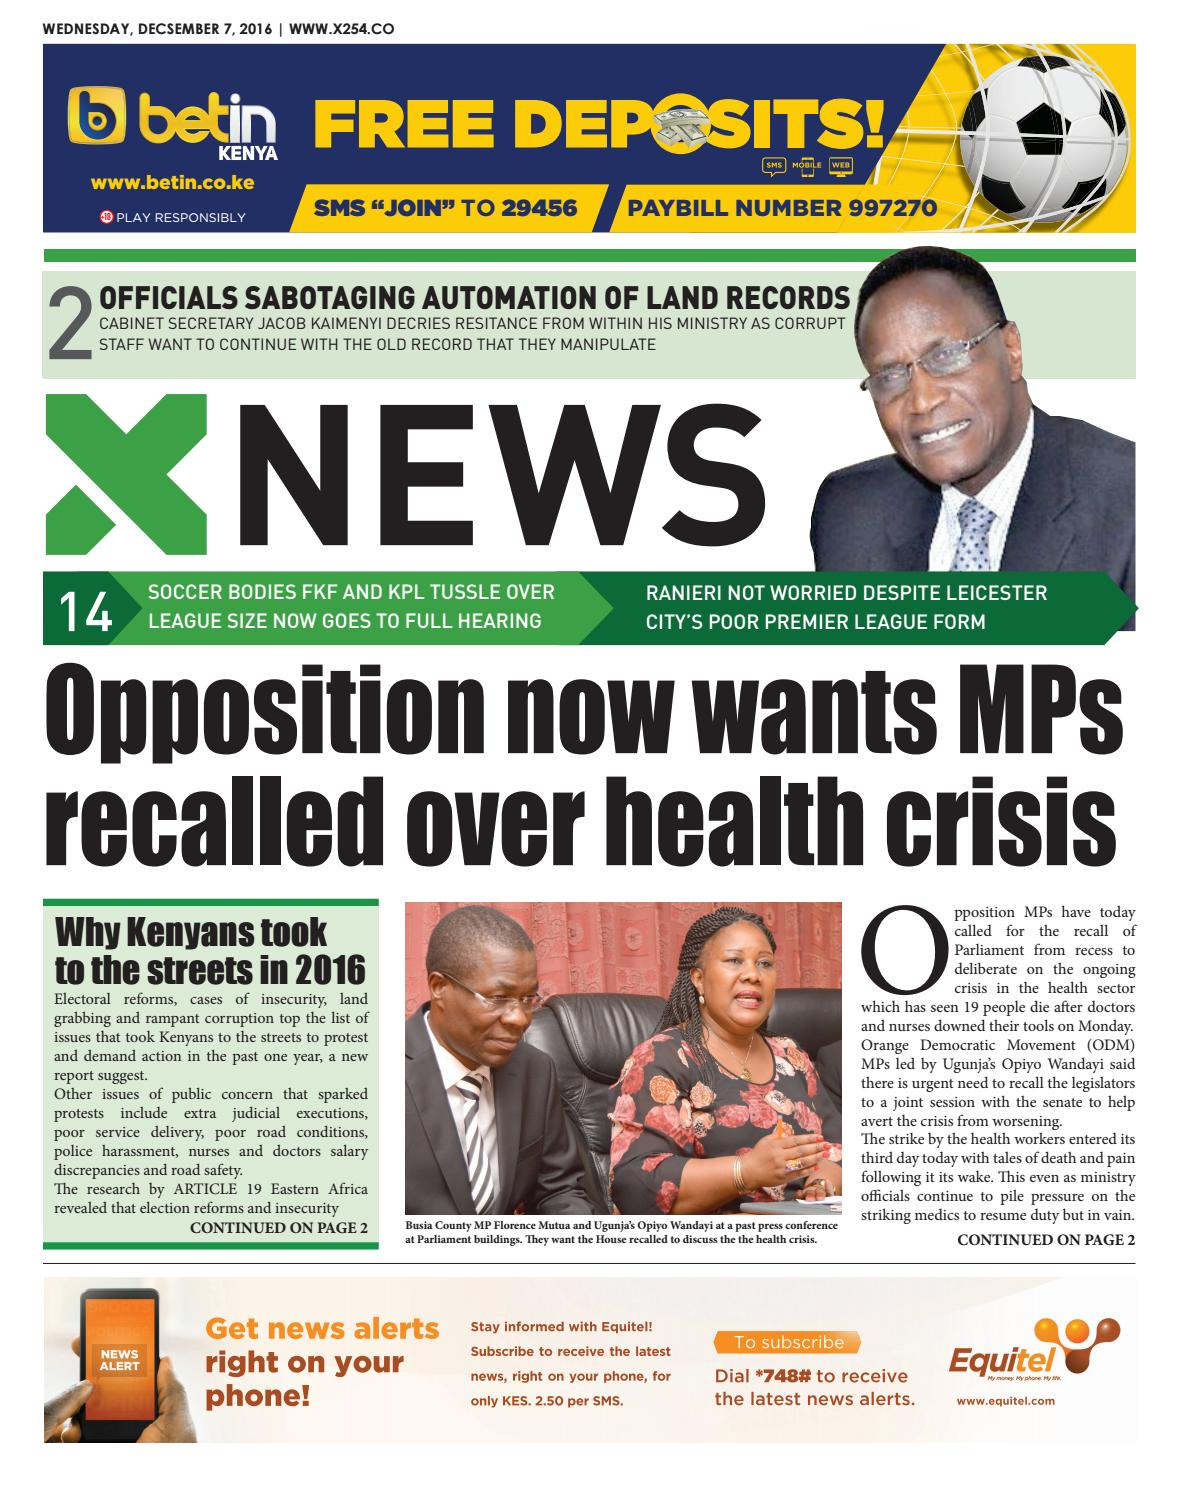 201601207 xnews by X News - issuu